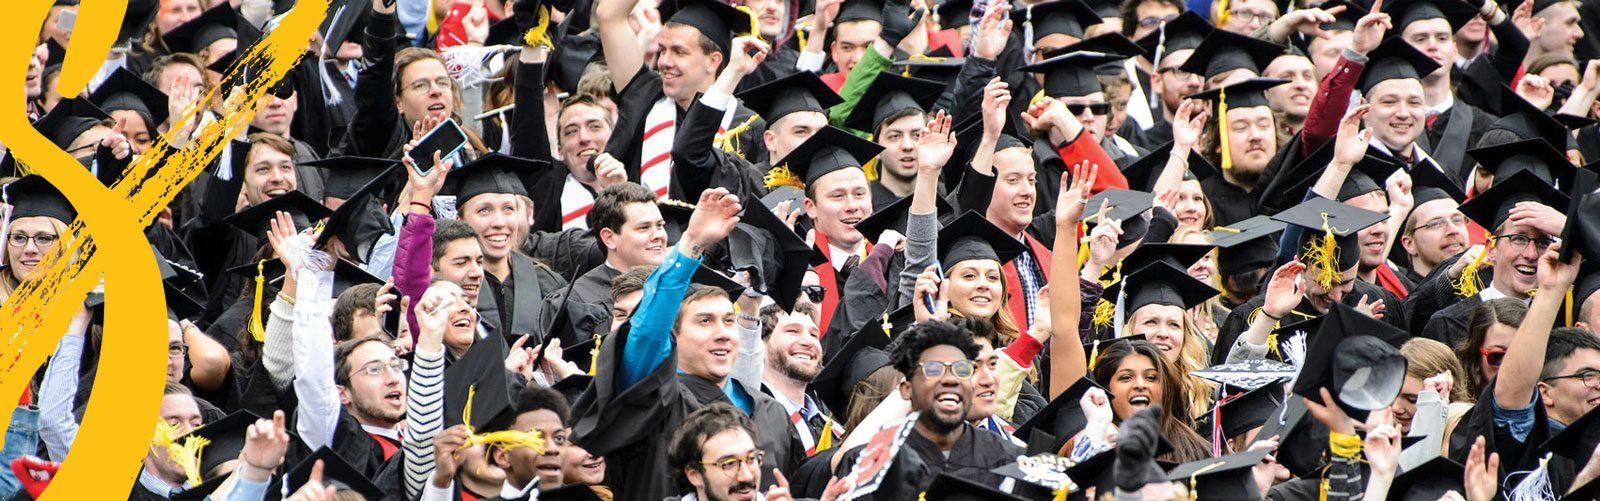 Happy students at graduation.